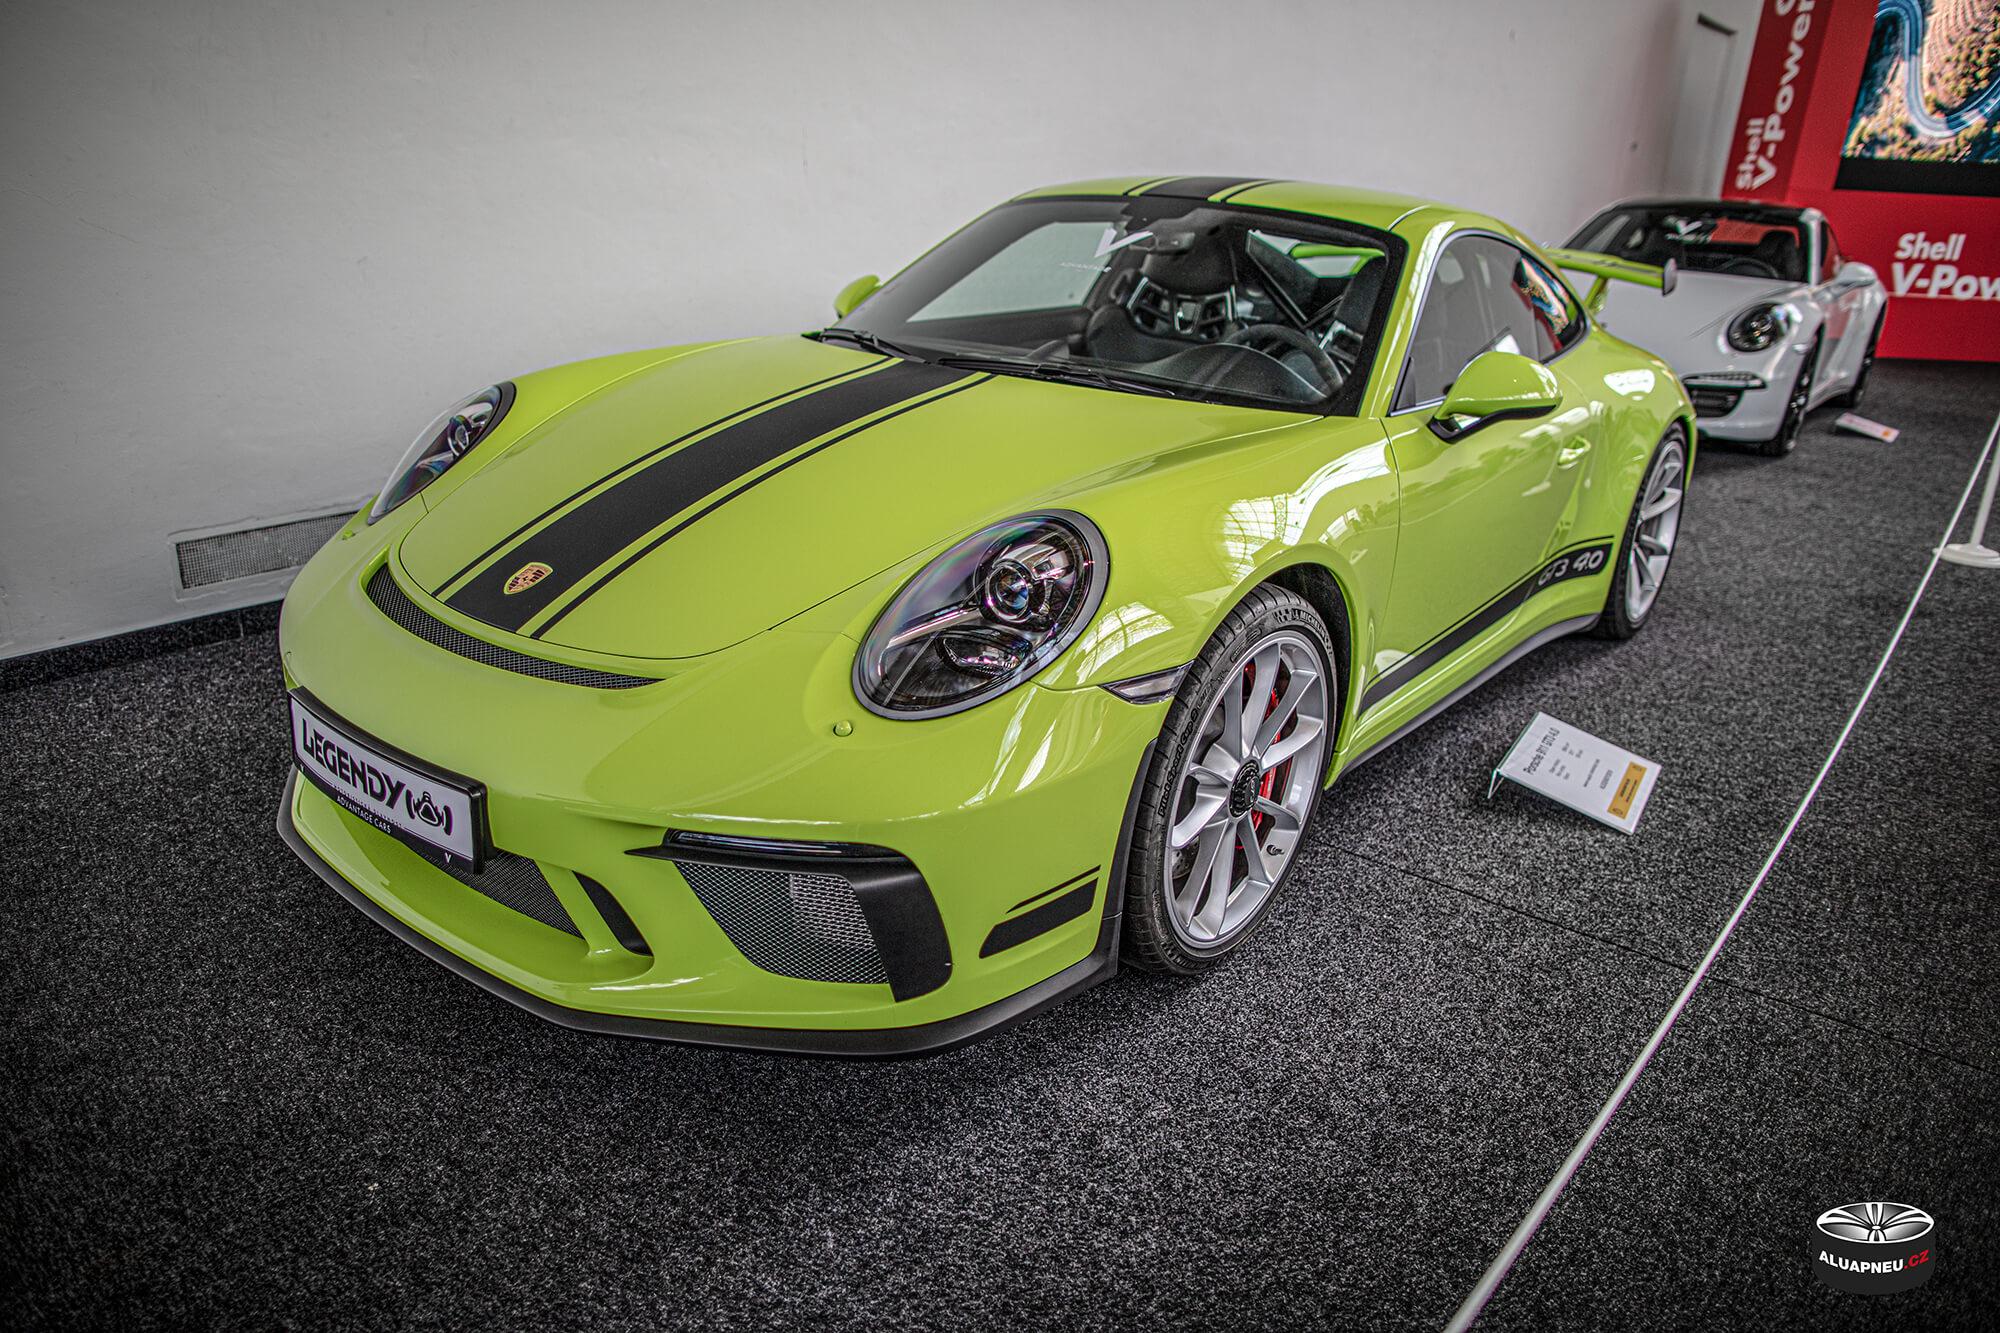 Originální elektrony Porsche - Automobilové Legendy 2019 - www.aluapneu.cz